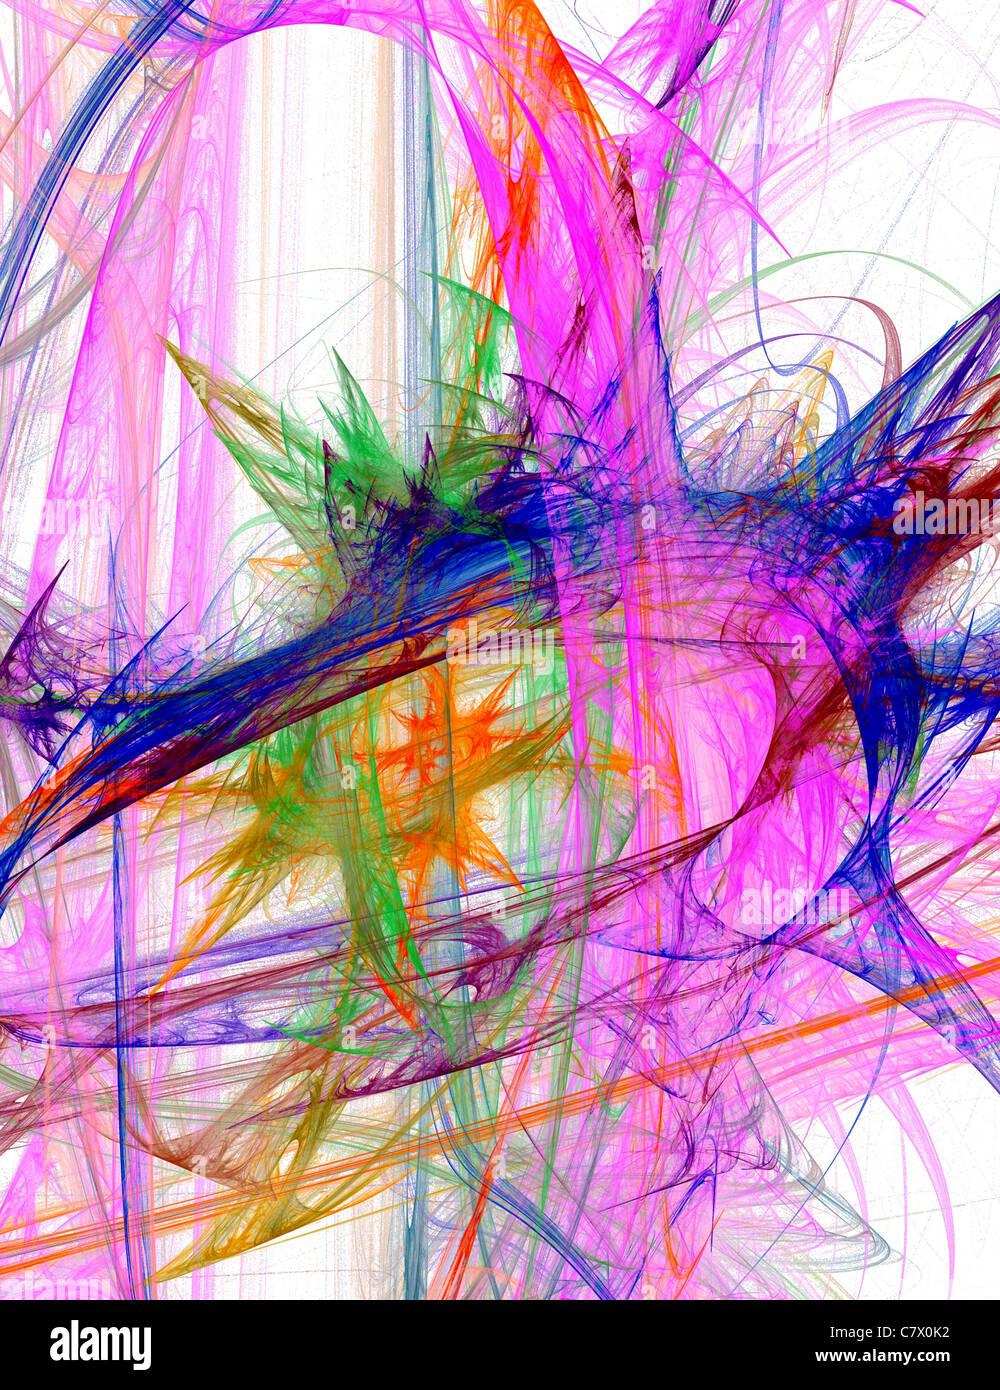 Punk abstract illustration - Stock Image